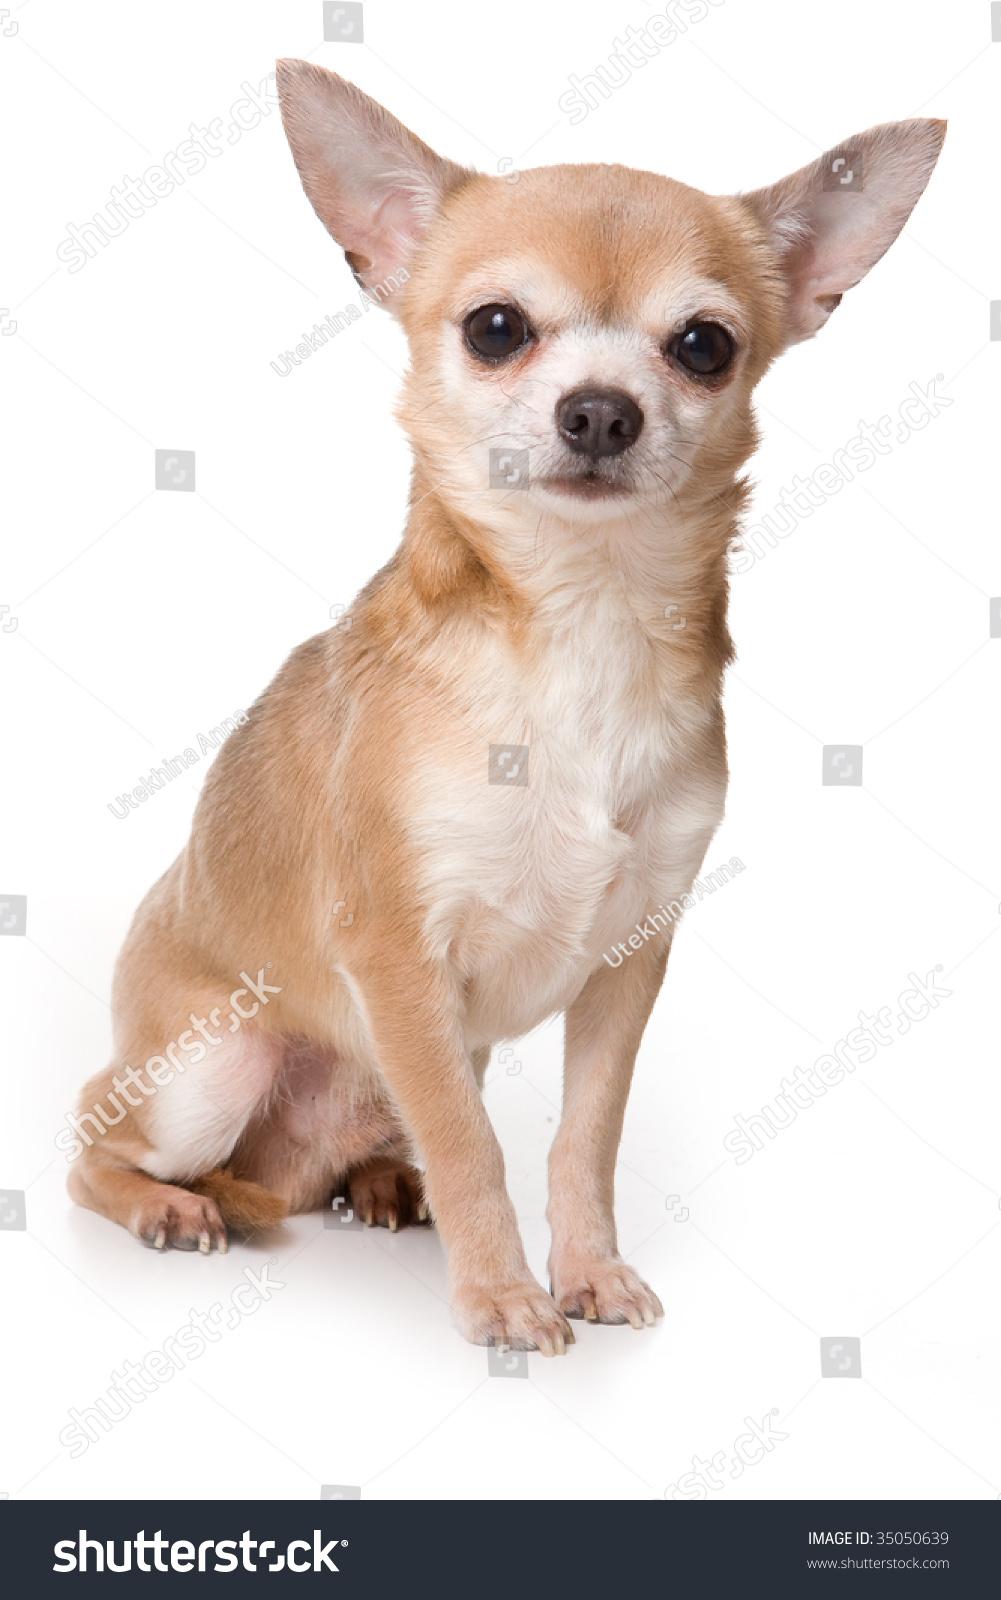 dog chihuahua background - photo #10